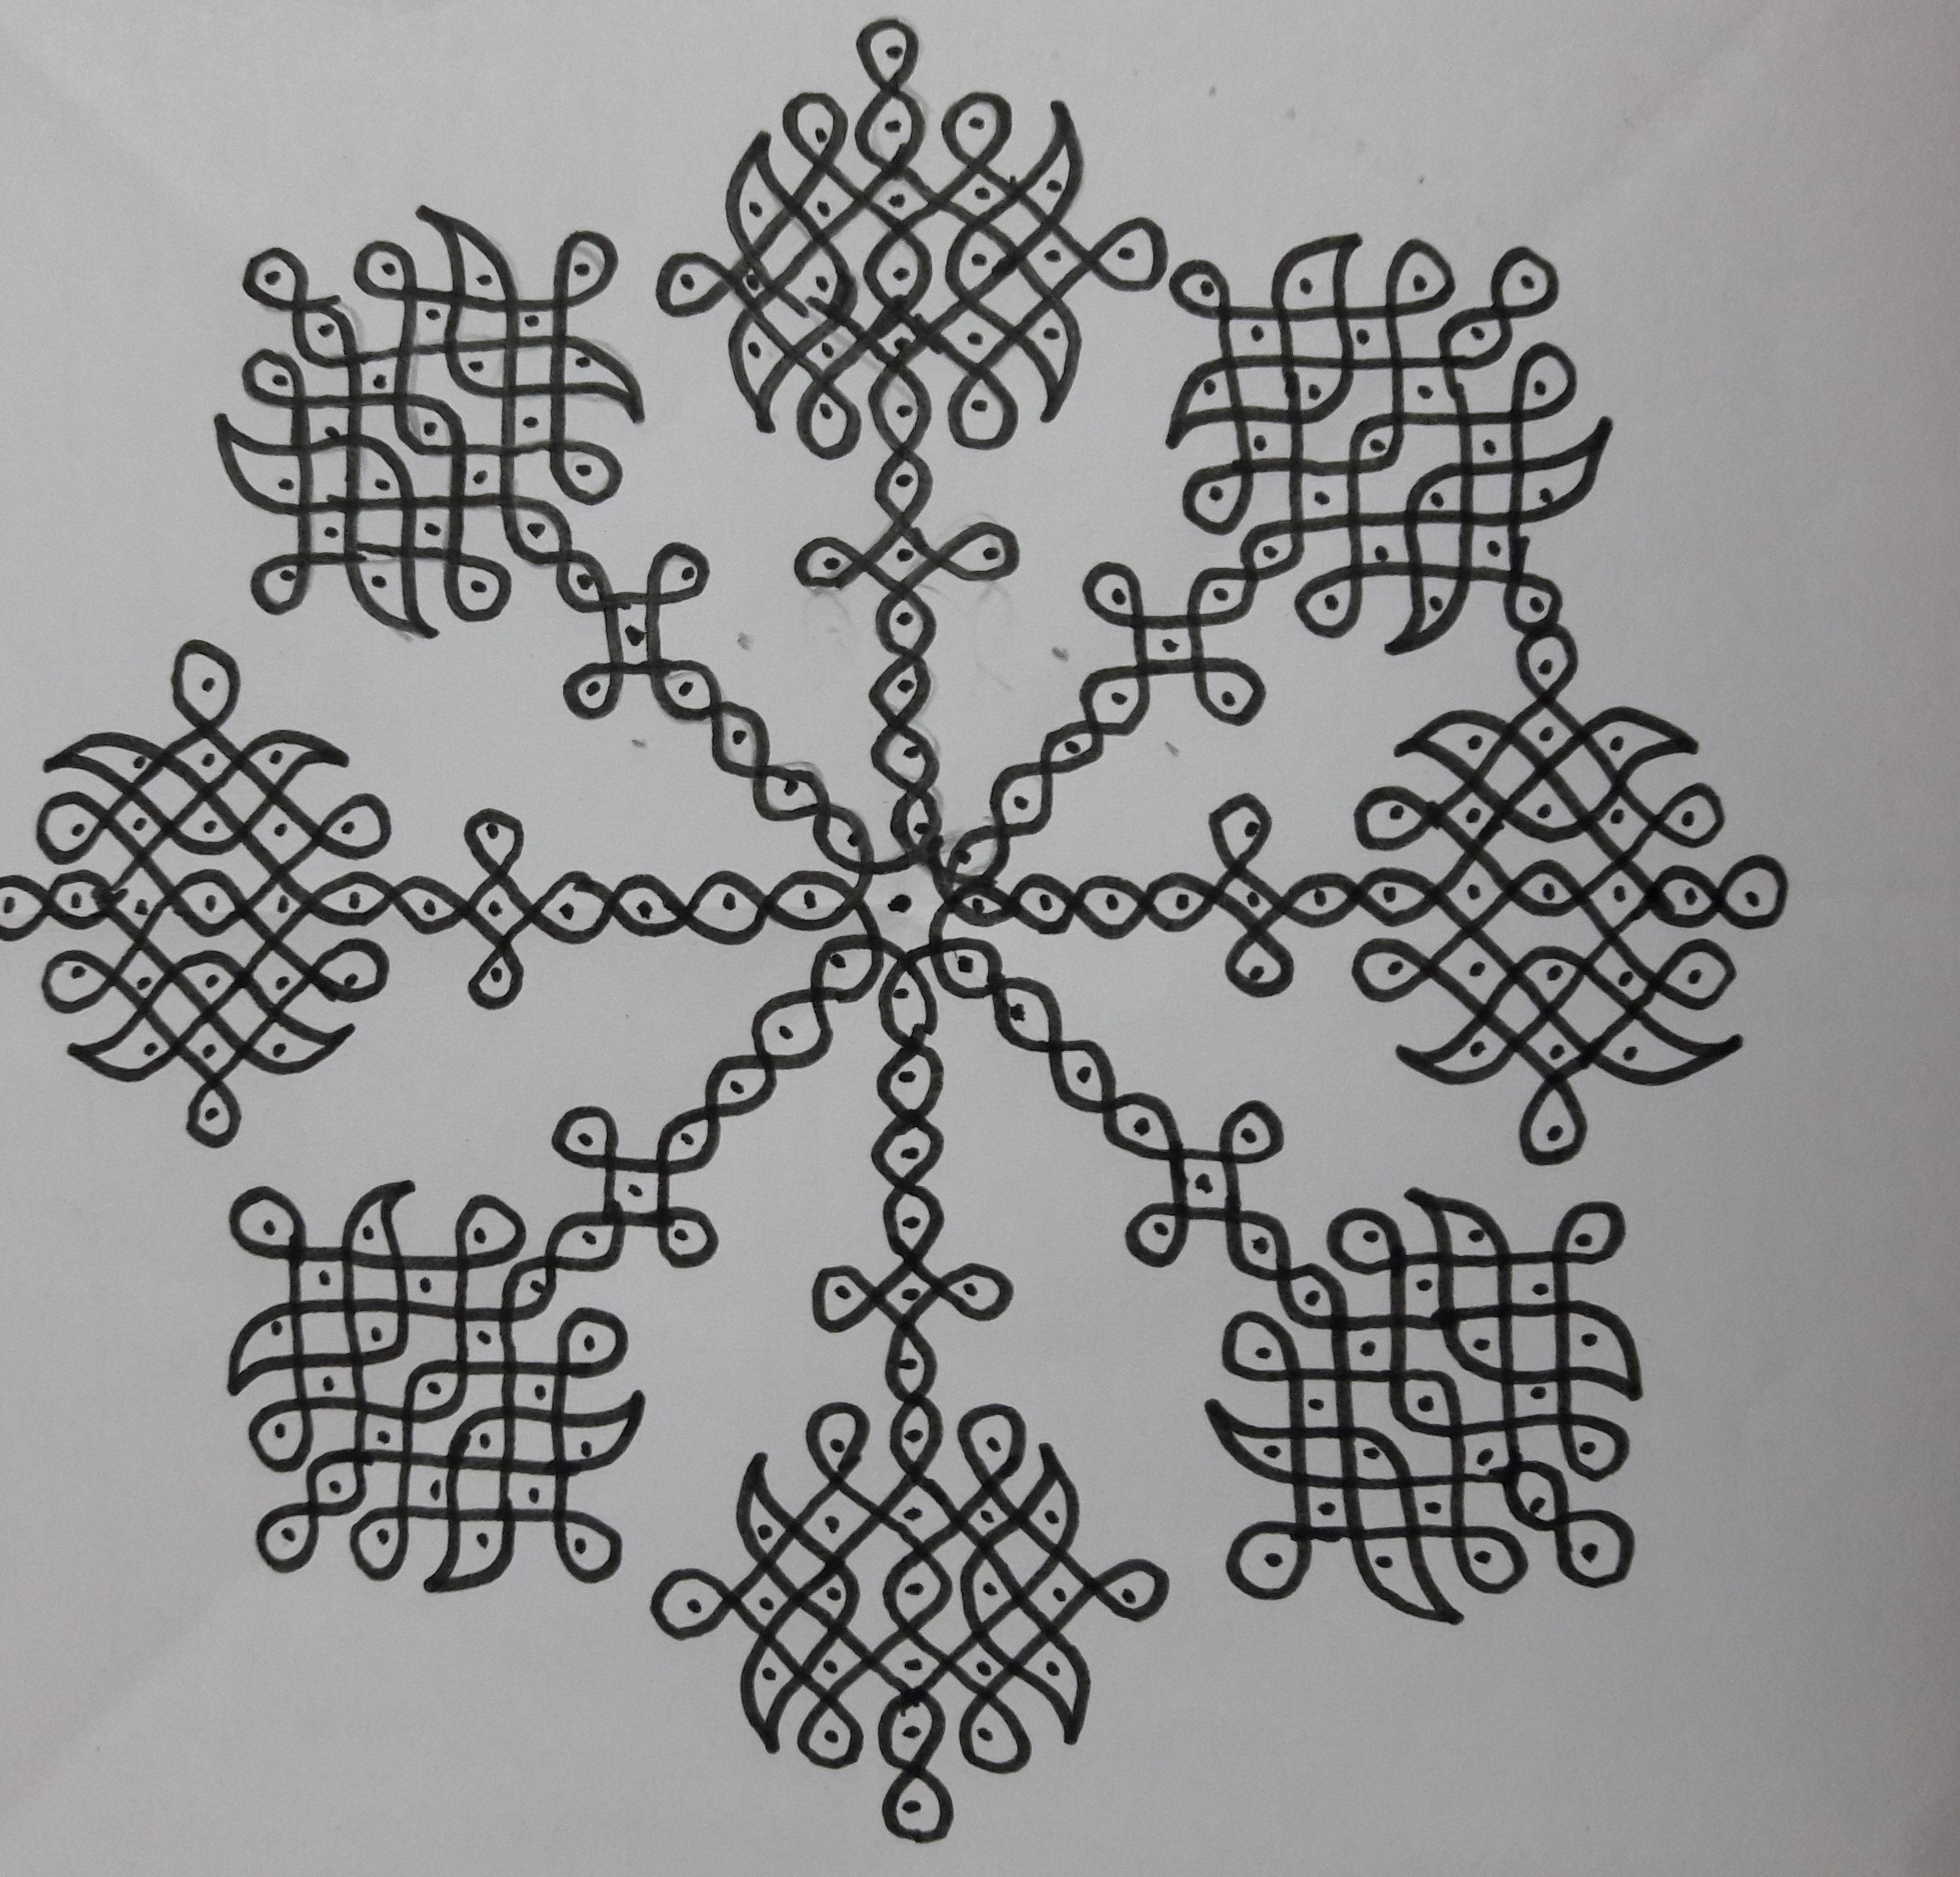 25 dots Sikku kolam || Contest Kolam 21